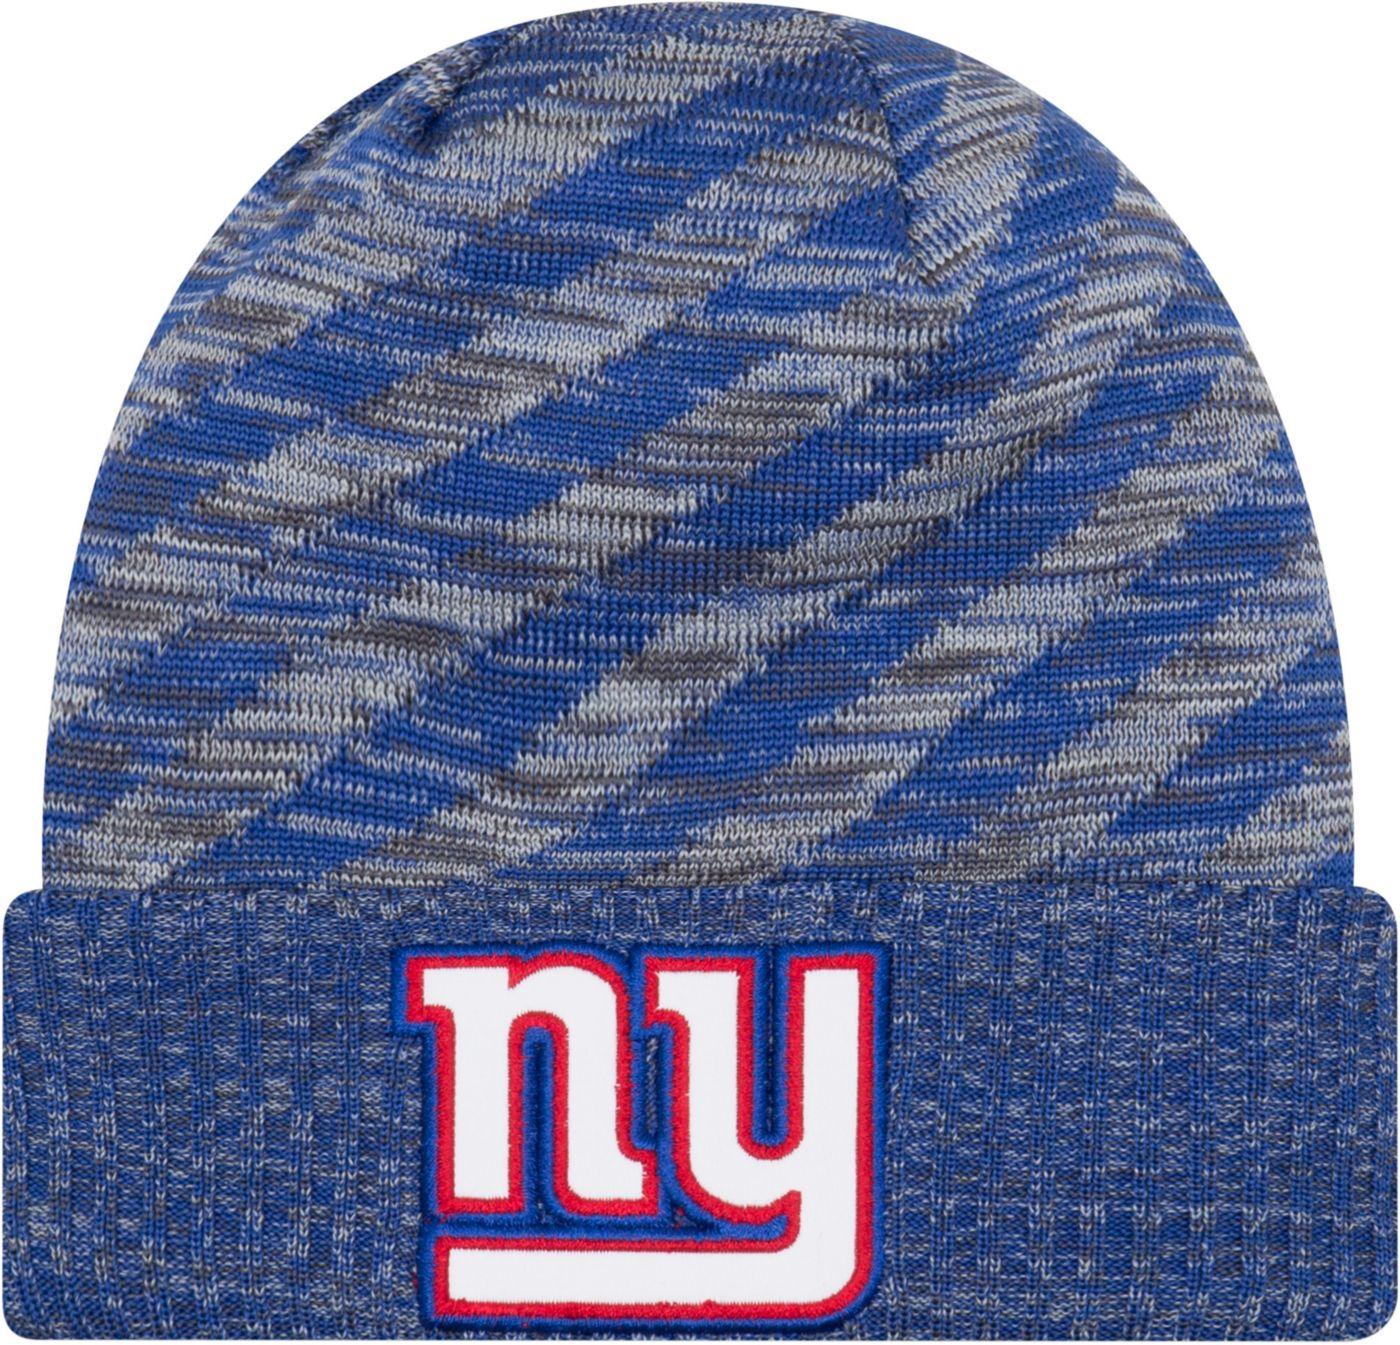 New Era Men's New York Giants Sideline Cold Weather TD Blue Knit